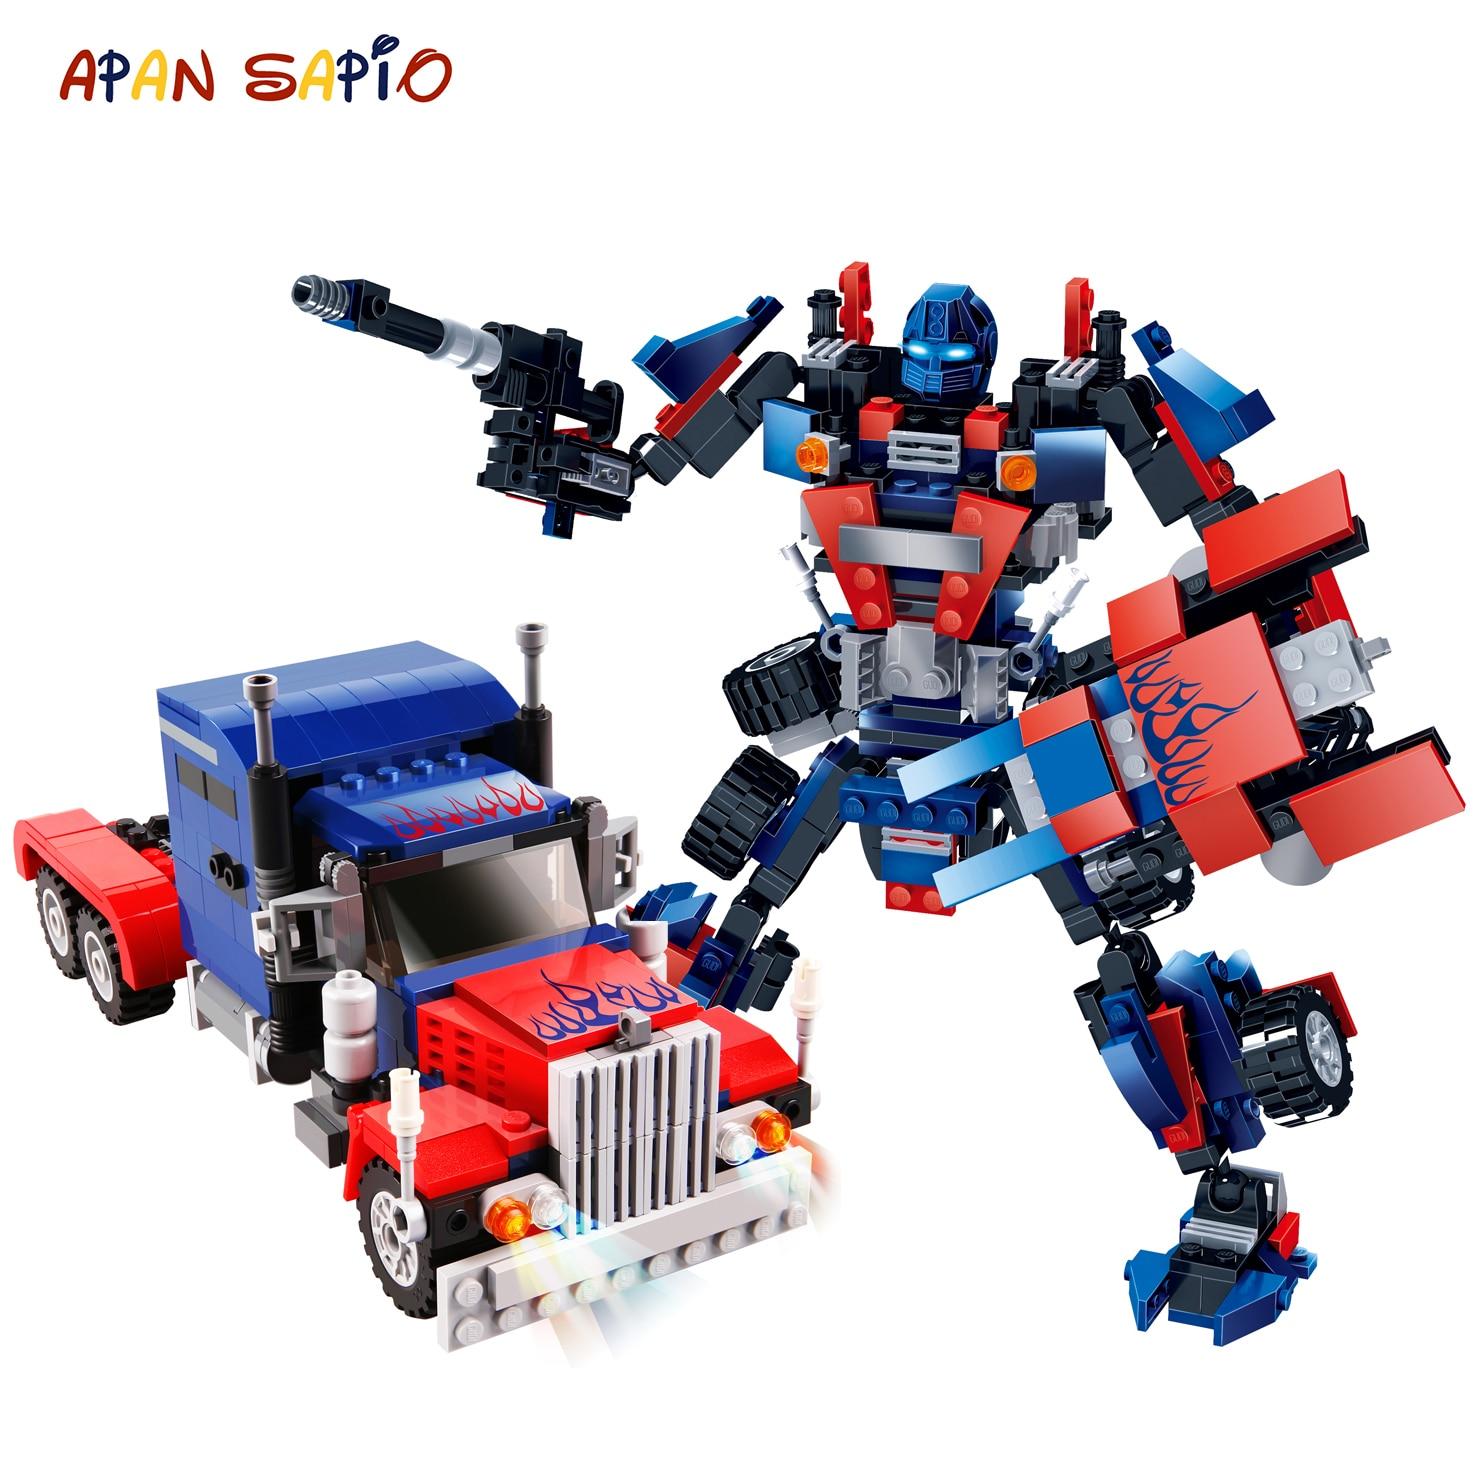 transformation-2in1-robot-serie-building-blocks-font-b-starwars-b-font-creator-educational-sets-figure-bricks-compatible-with-legoe-kids-gifts